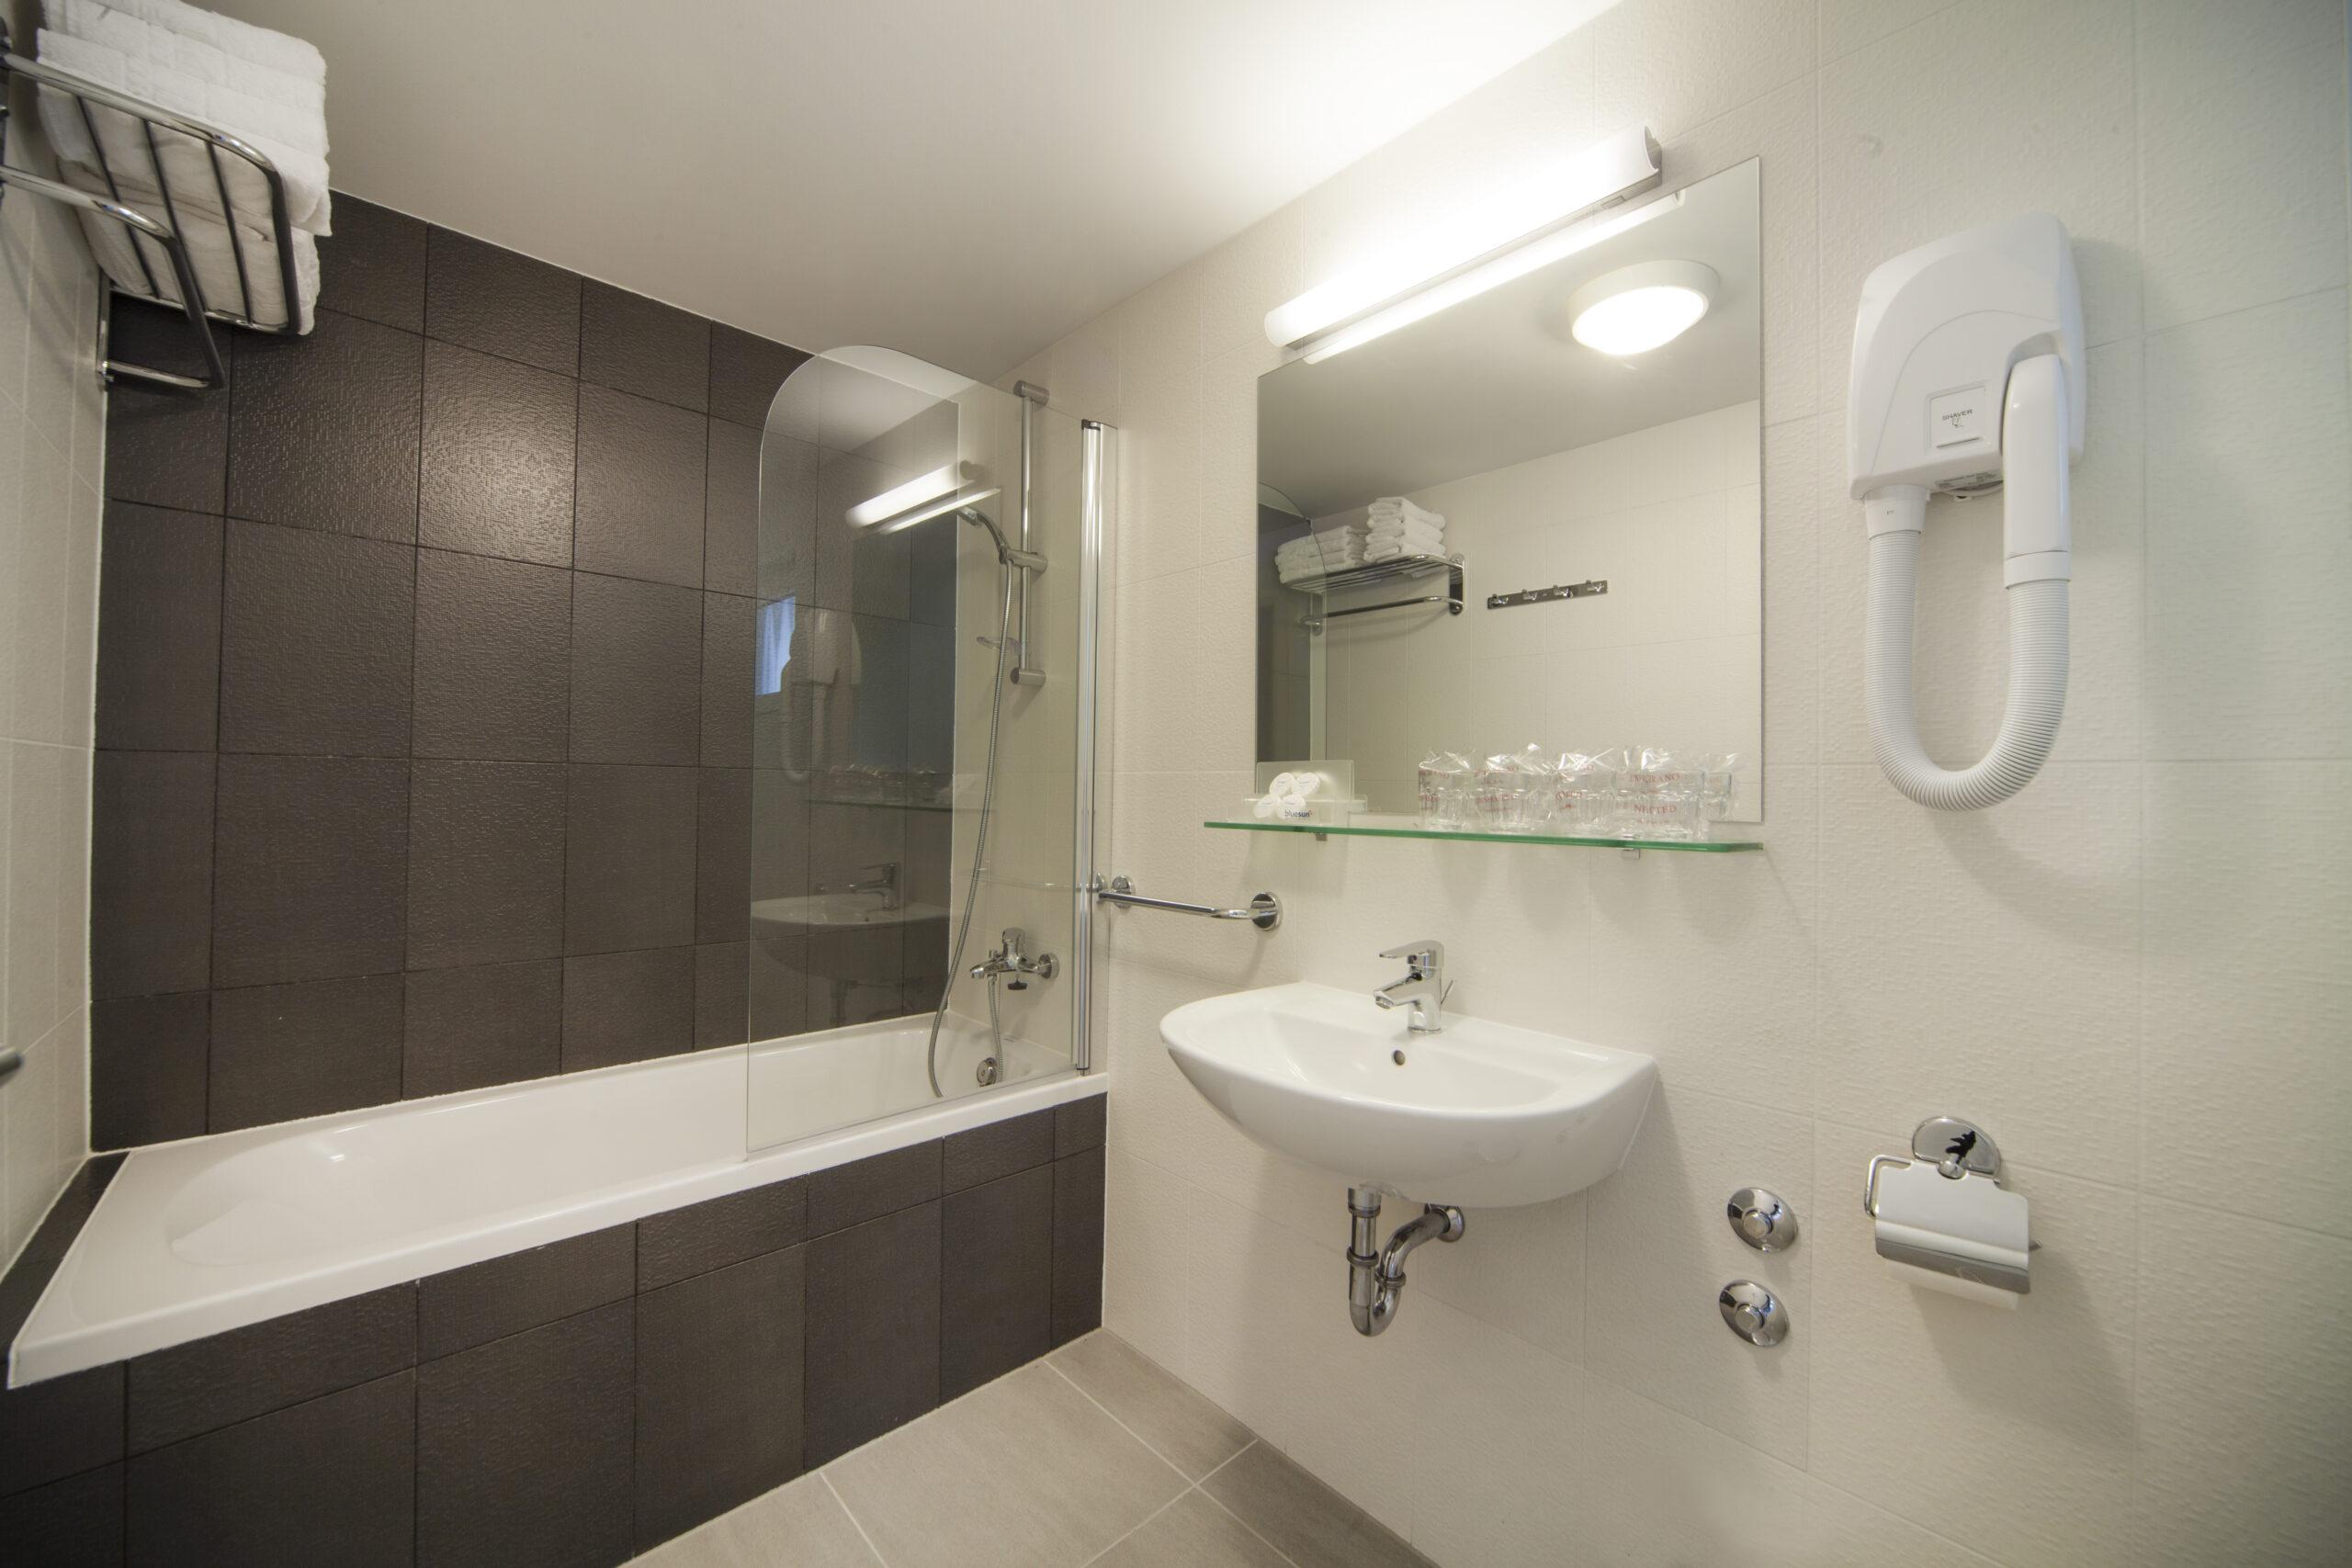 Neptun_Depadance_Family_Room - Annex - Bathroom